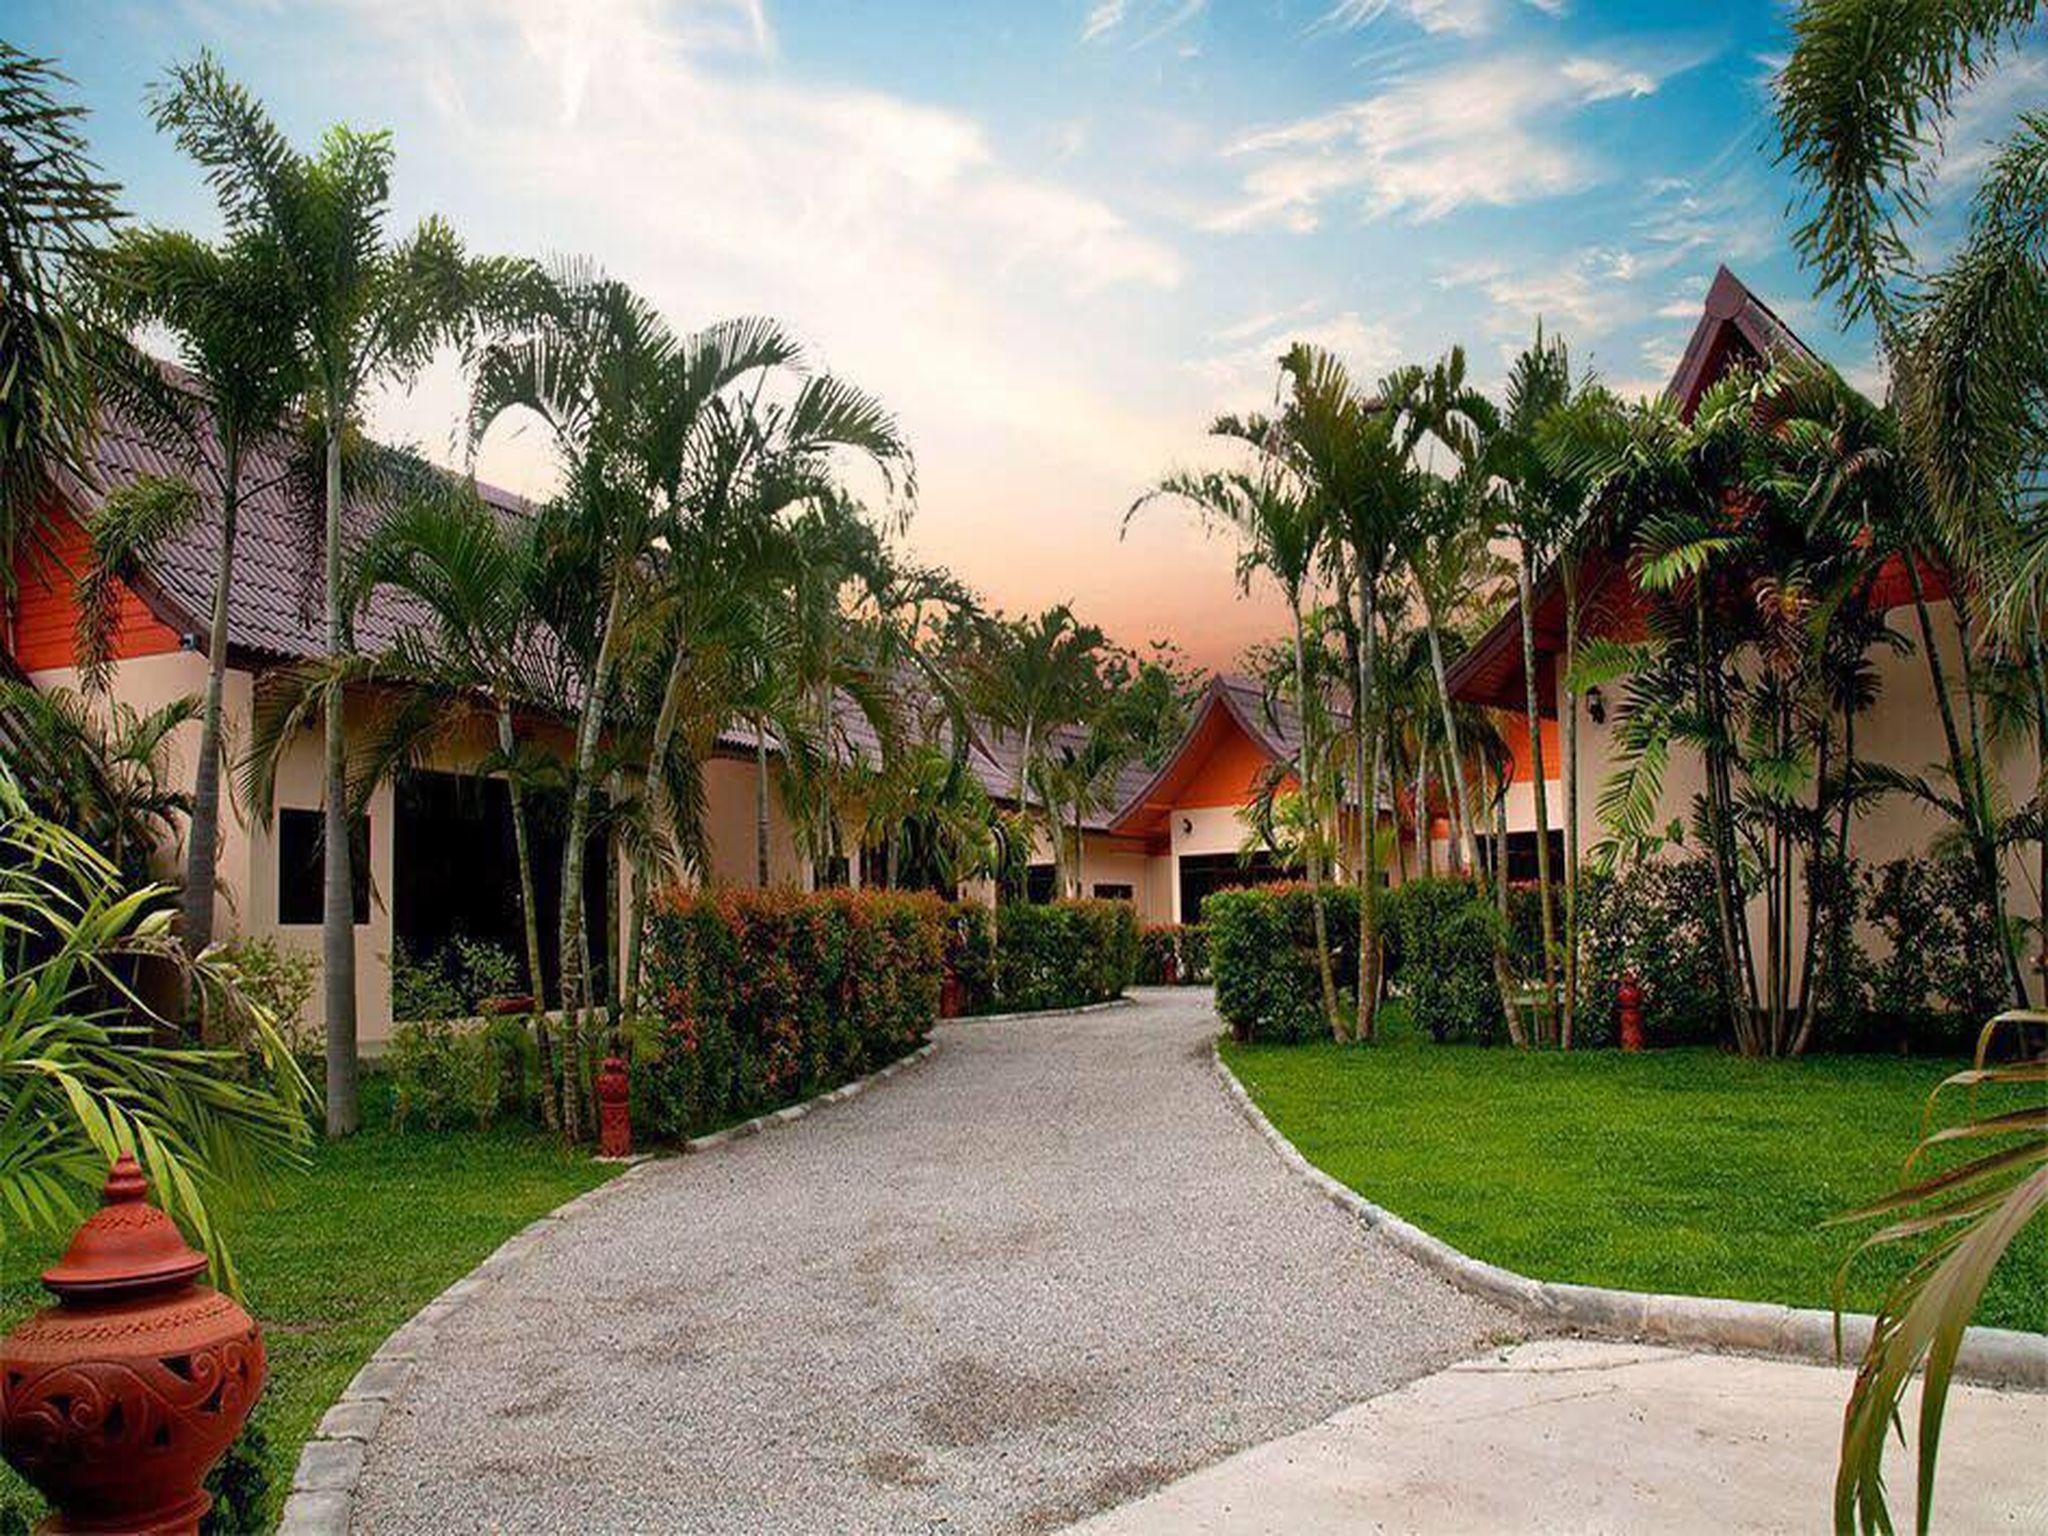 Rommai Reunngam Resort ร่มไม้ เรือนงาม รีสอร์ต